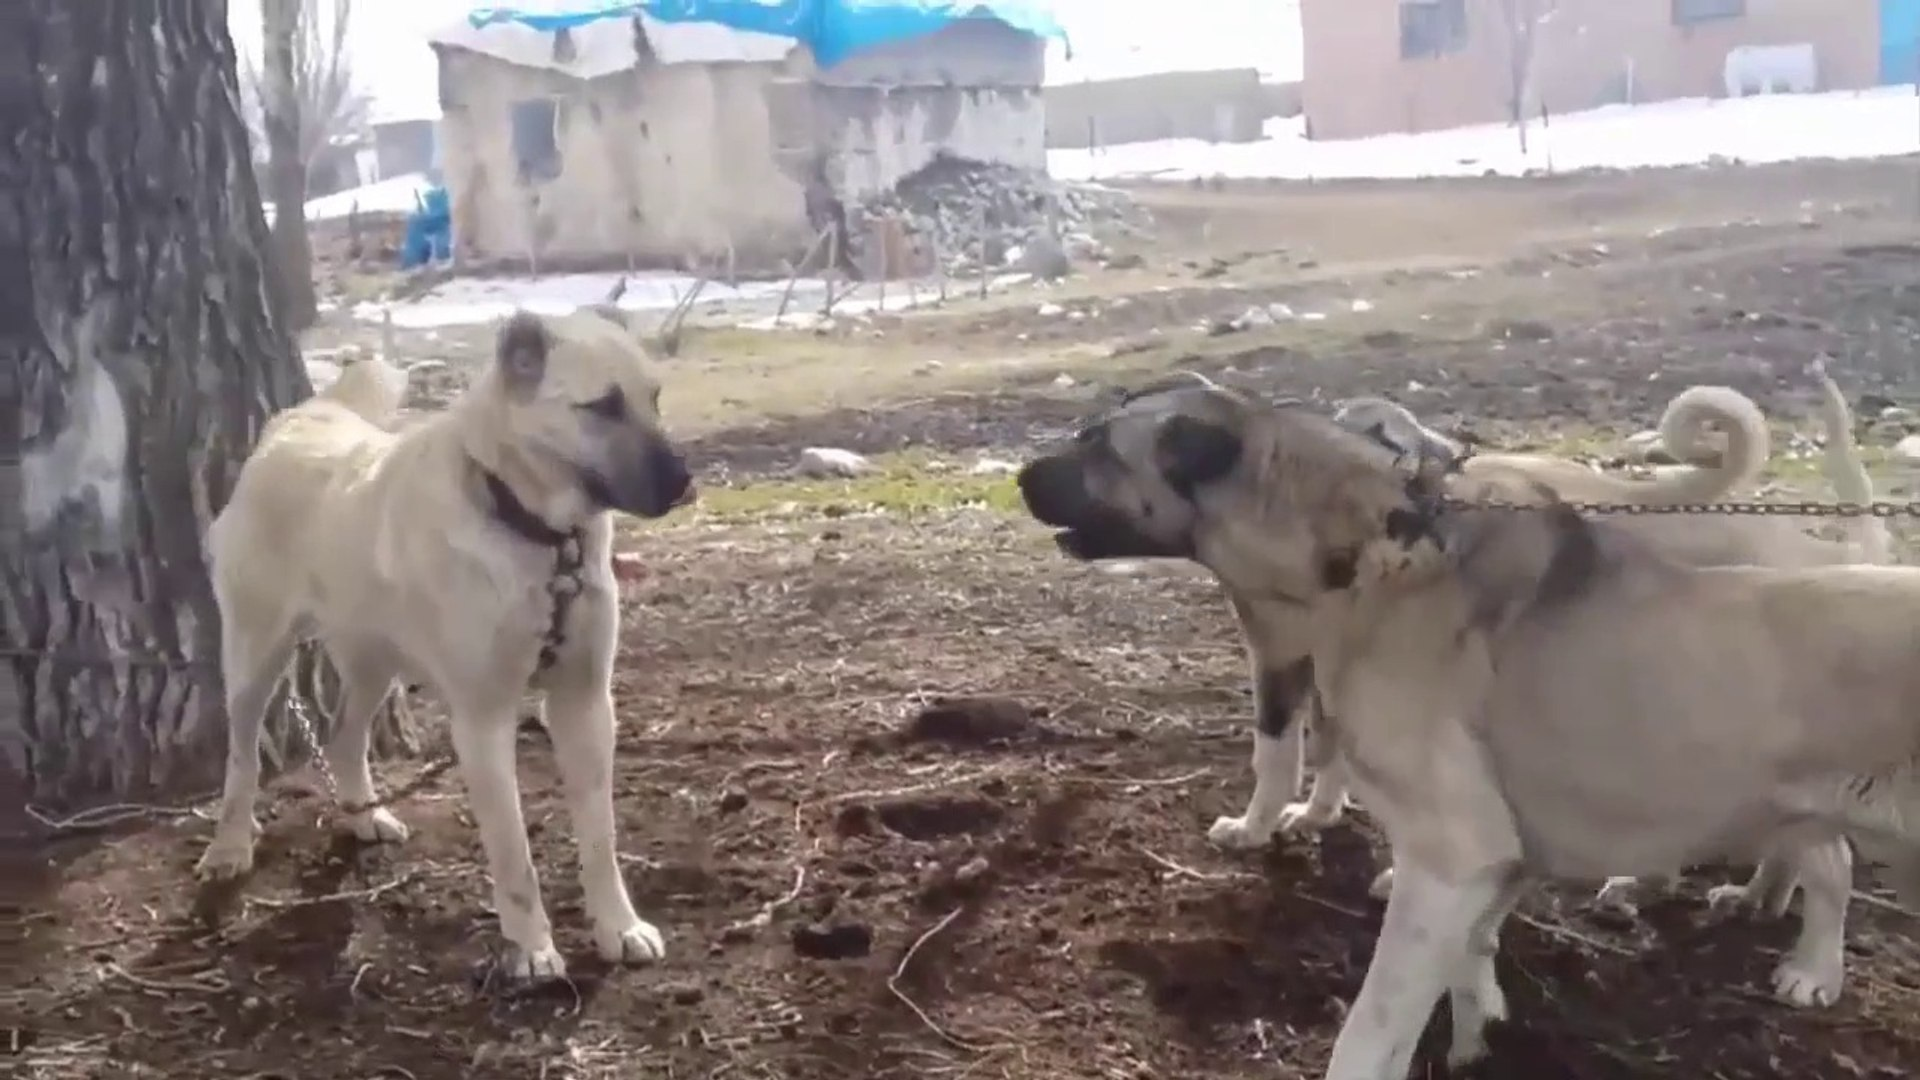 COBAN KOPEGi YAVRULARI ERKEKLESiYOR - SHEPHERD DOG PUPPiES VS